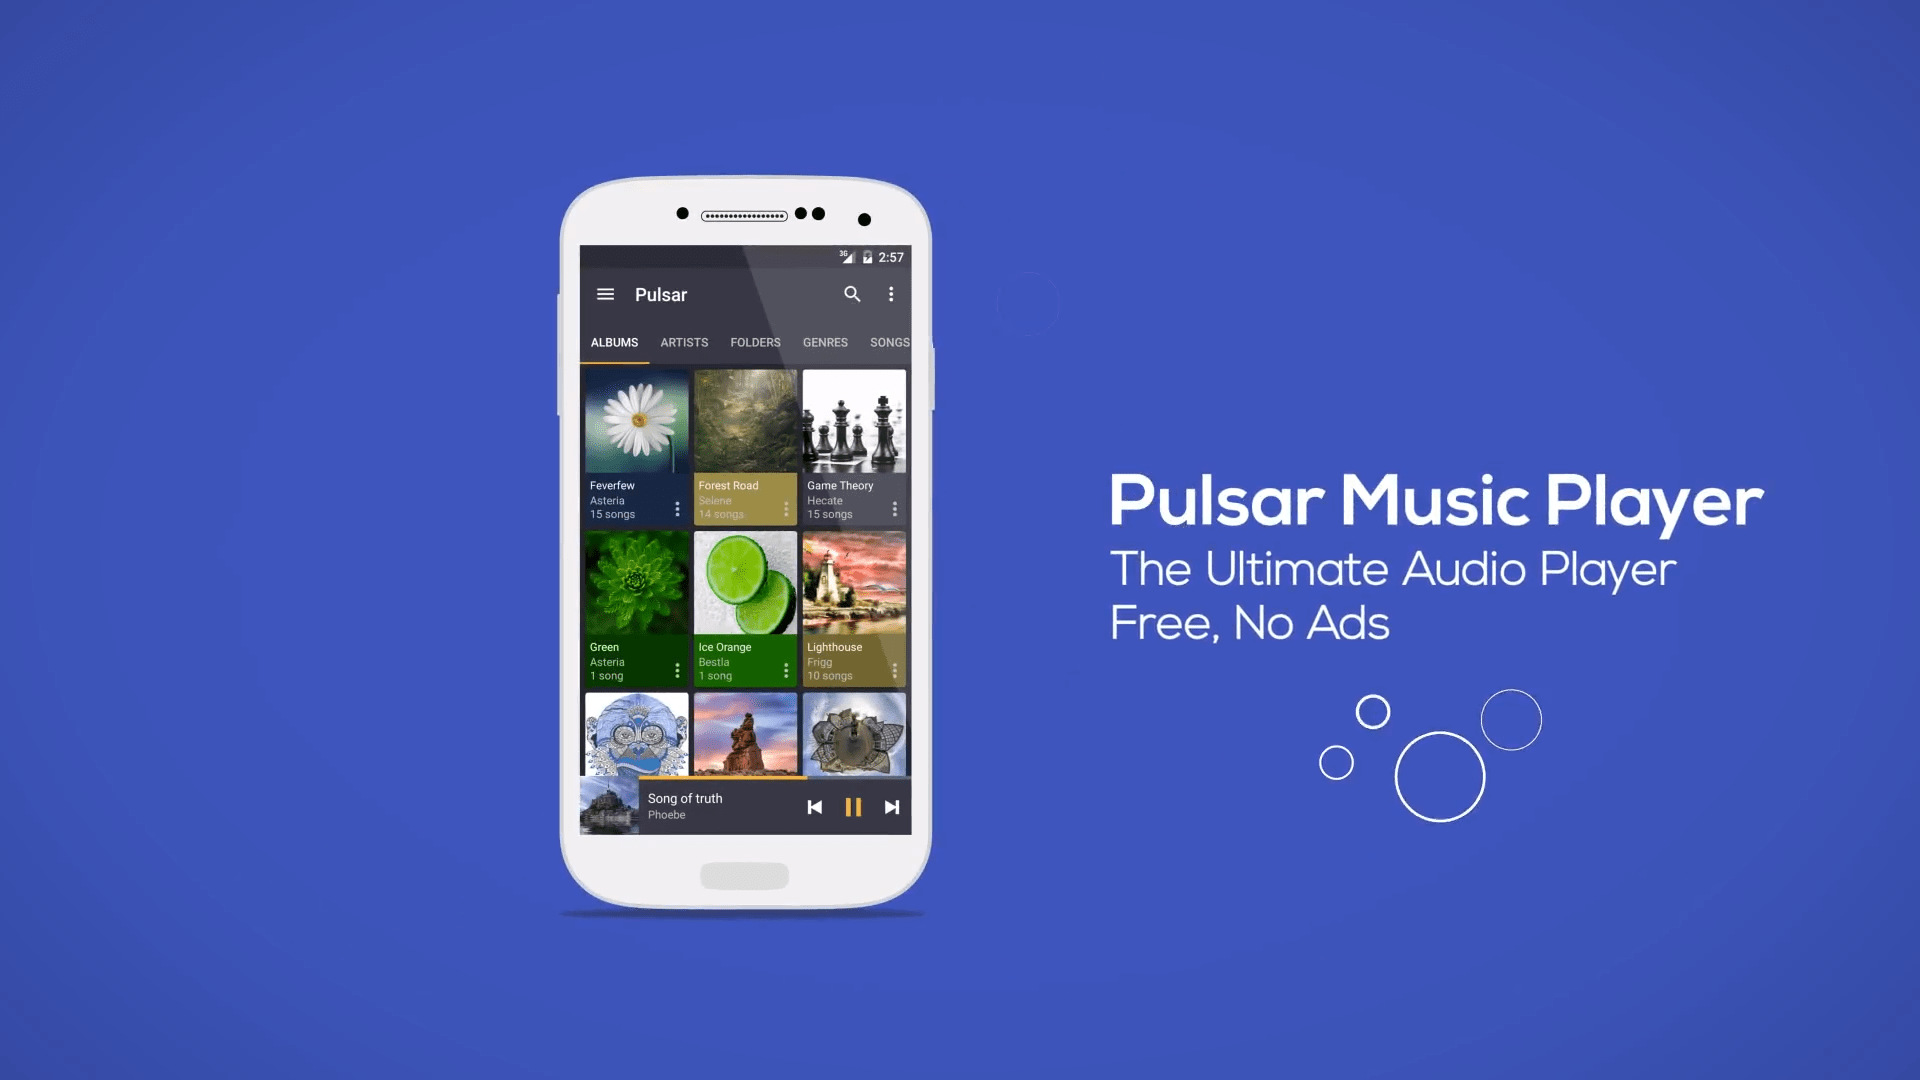 Pulsar Music Player 2